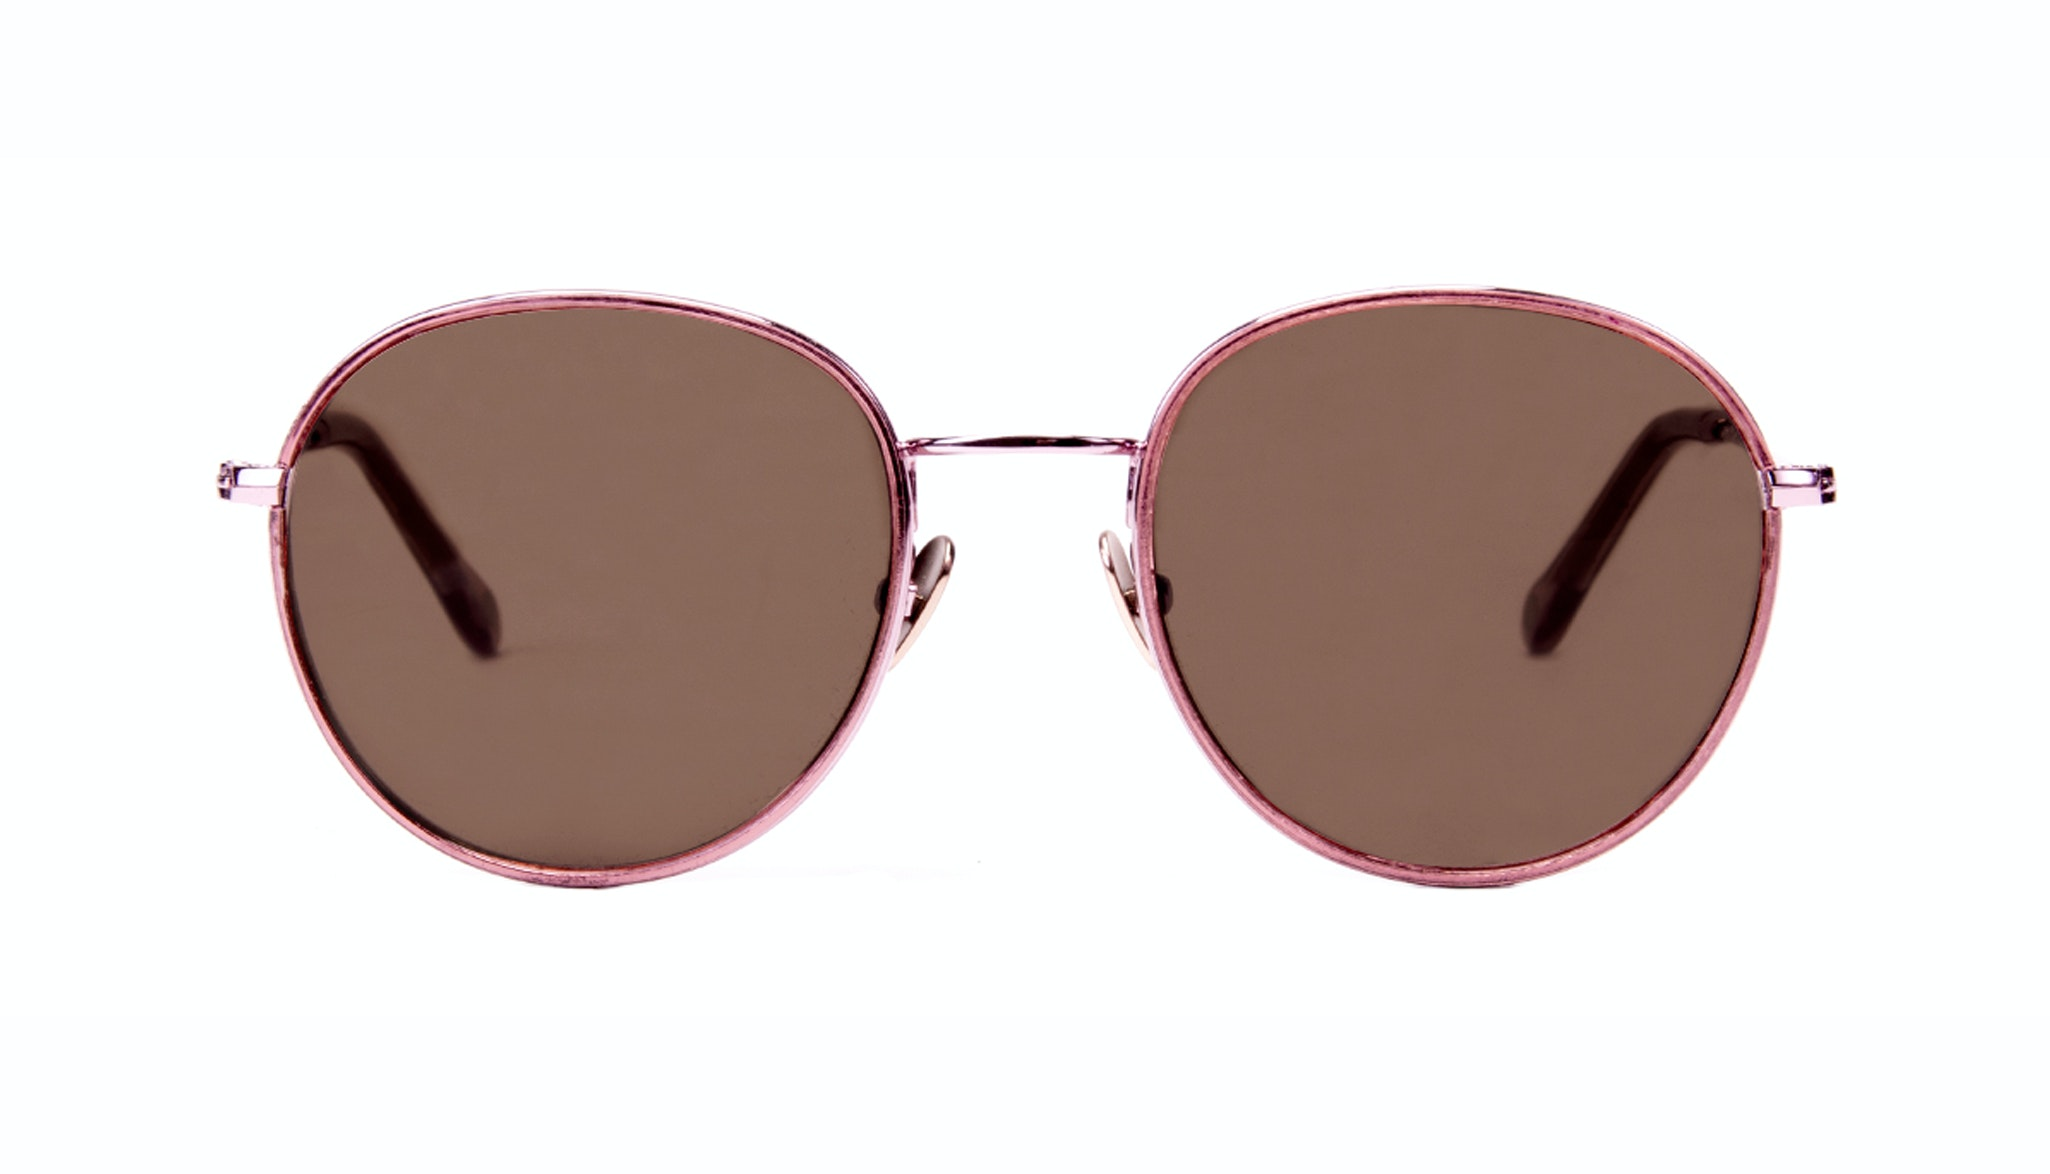 Affordable Fashion Glasses Aviator Round Eyeglasses Women Subrosa Romance